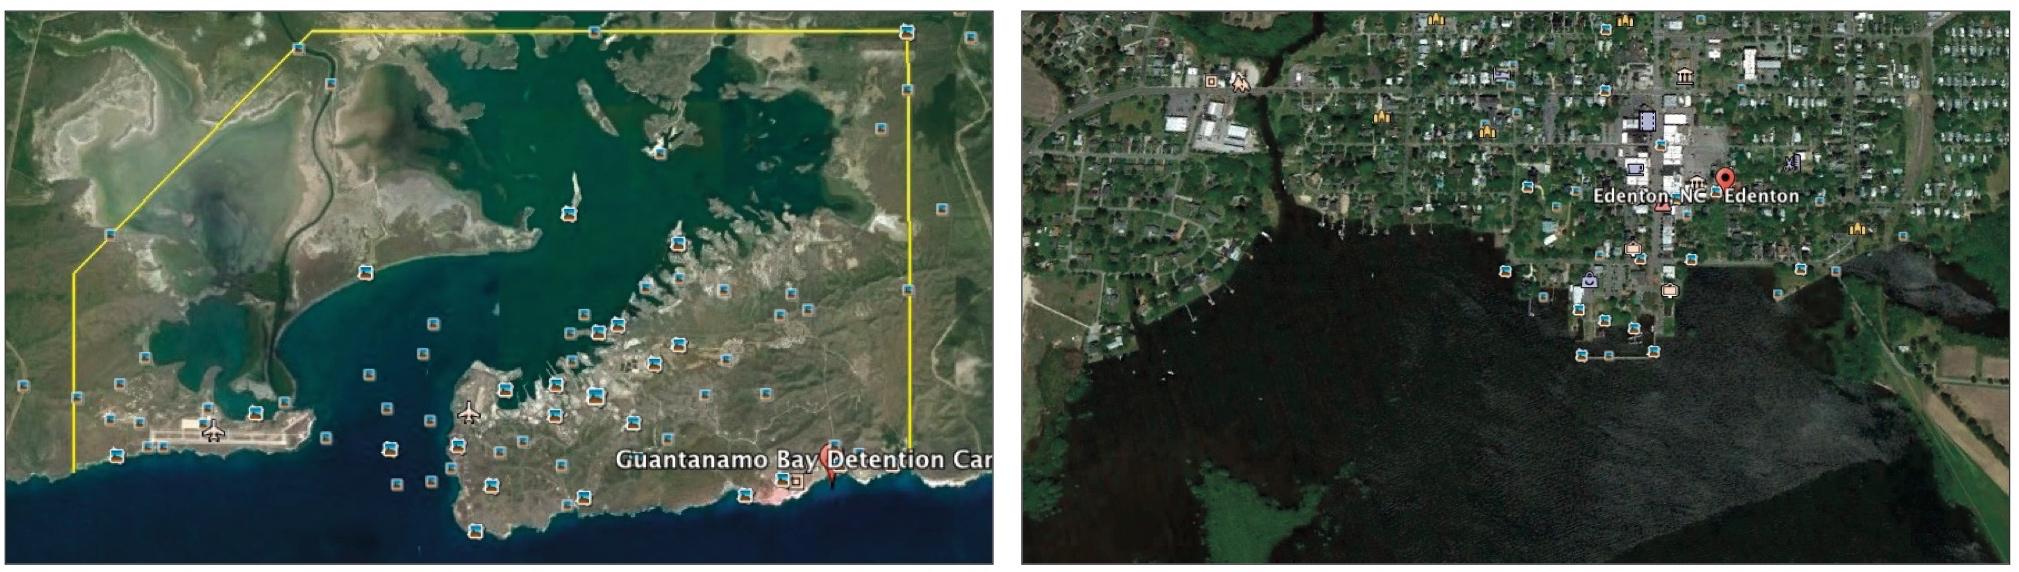 Guantanamo Bay, Cuba, left; Edenton, N.C.